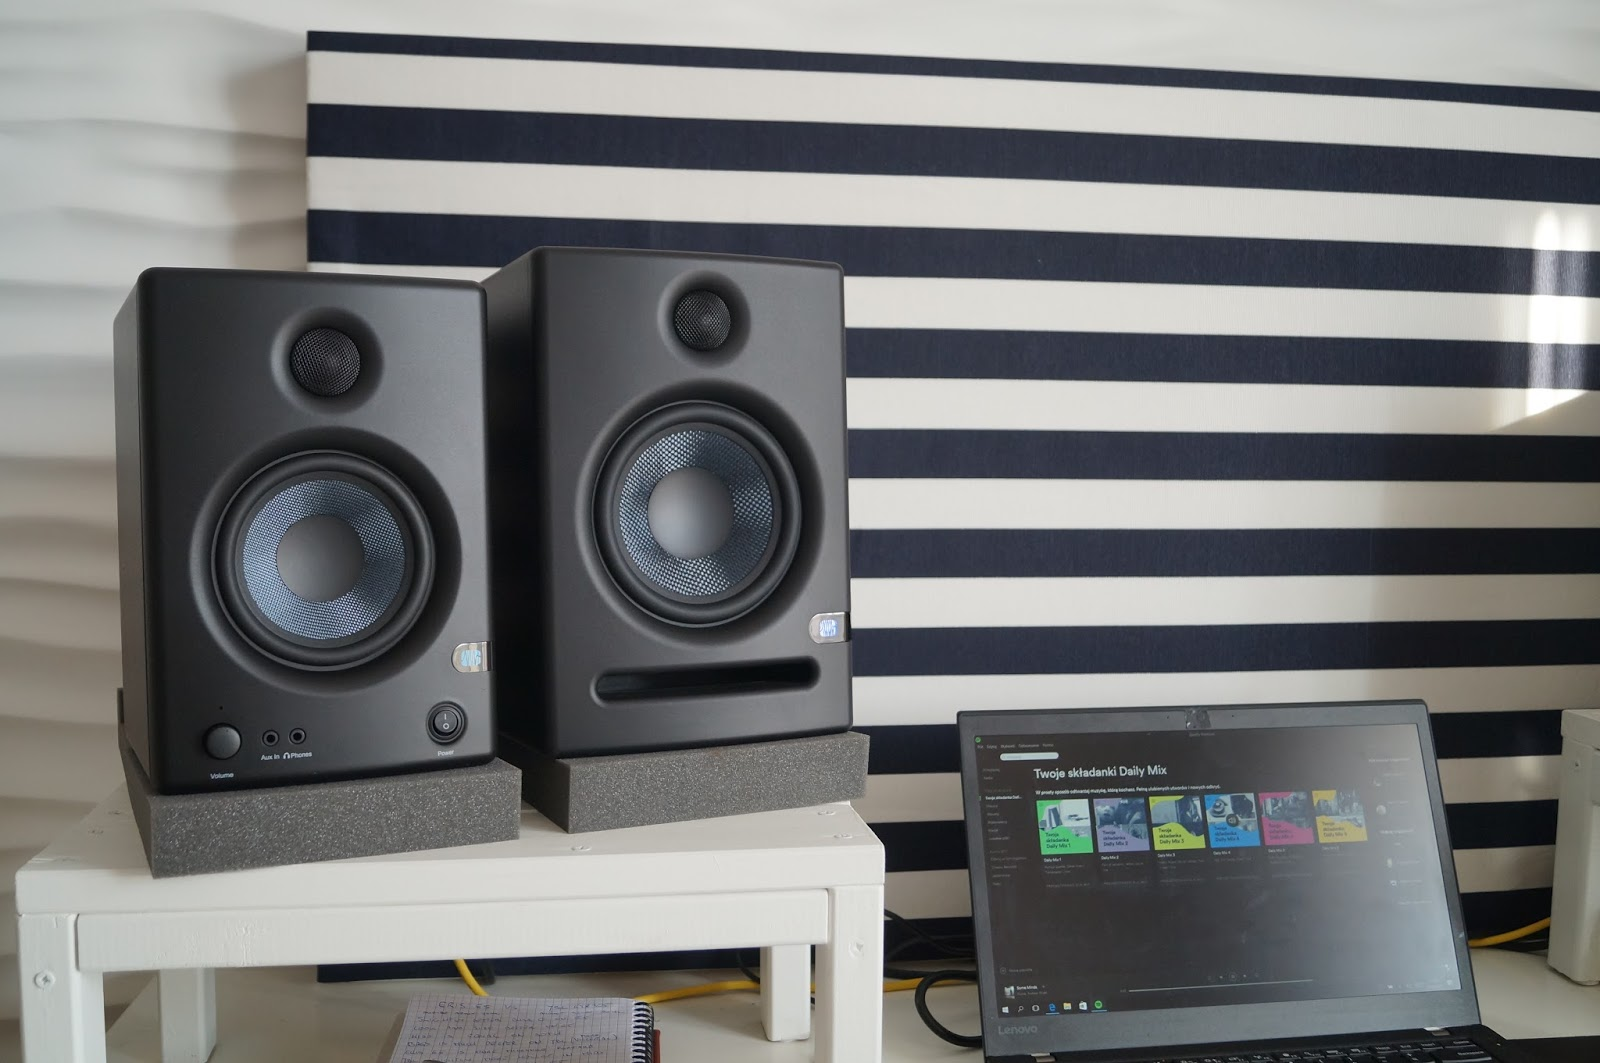 presonus eris e5 active monitor review eris e5 fights eris e4 5 and jbl lsr305 fails to engage. Black Bedroom Furniture Sets. Home Design Ideas